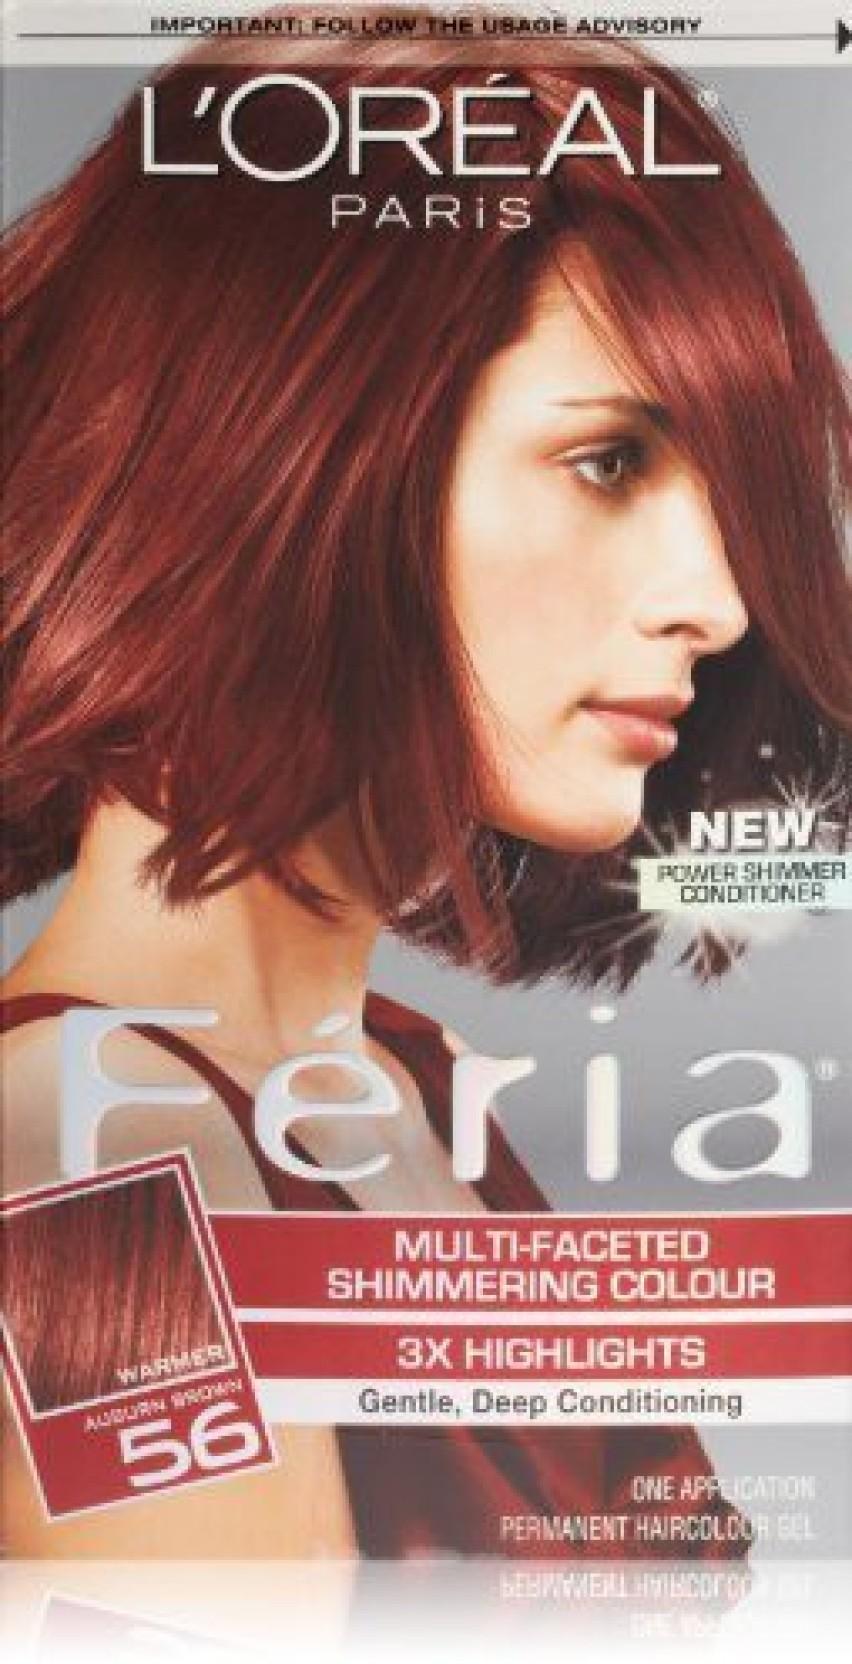 Tresemme Feria Hair Color 56 Auburn Hair Color Price In India